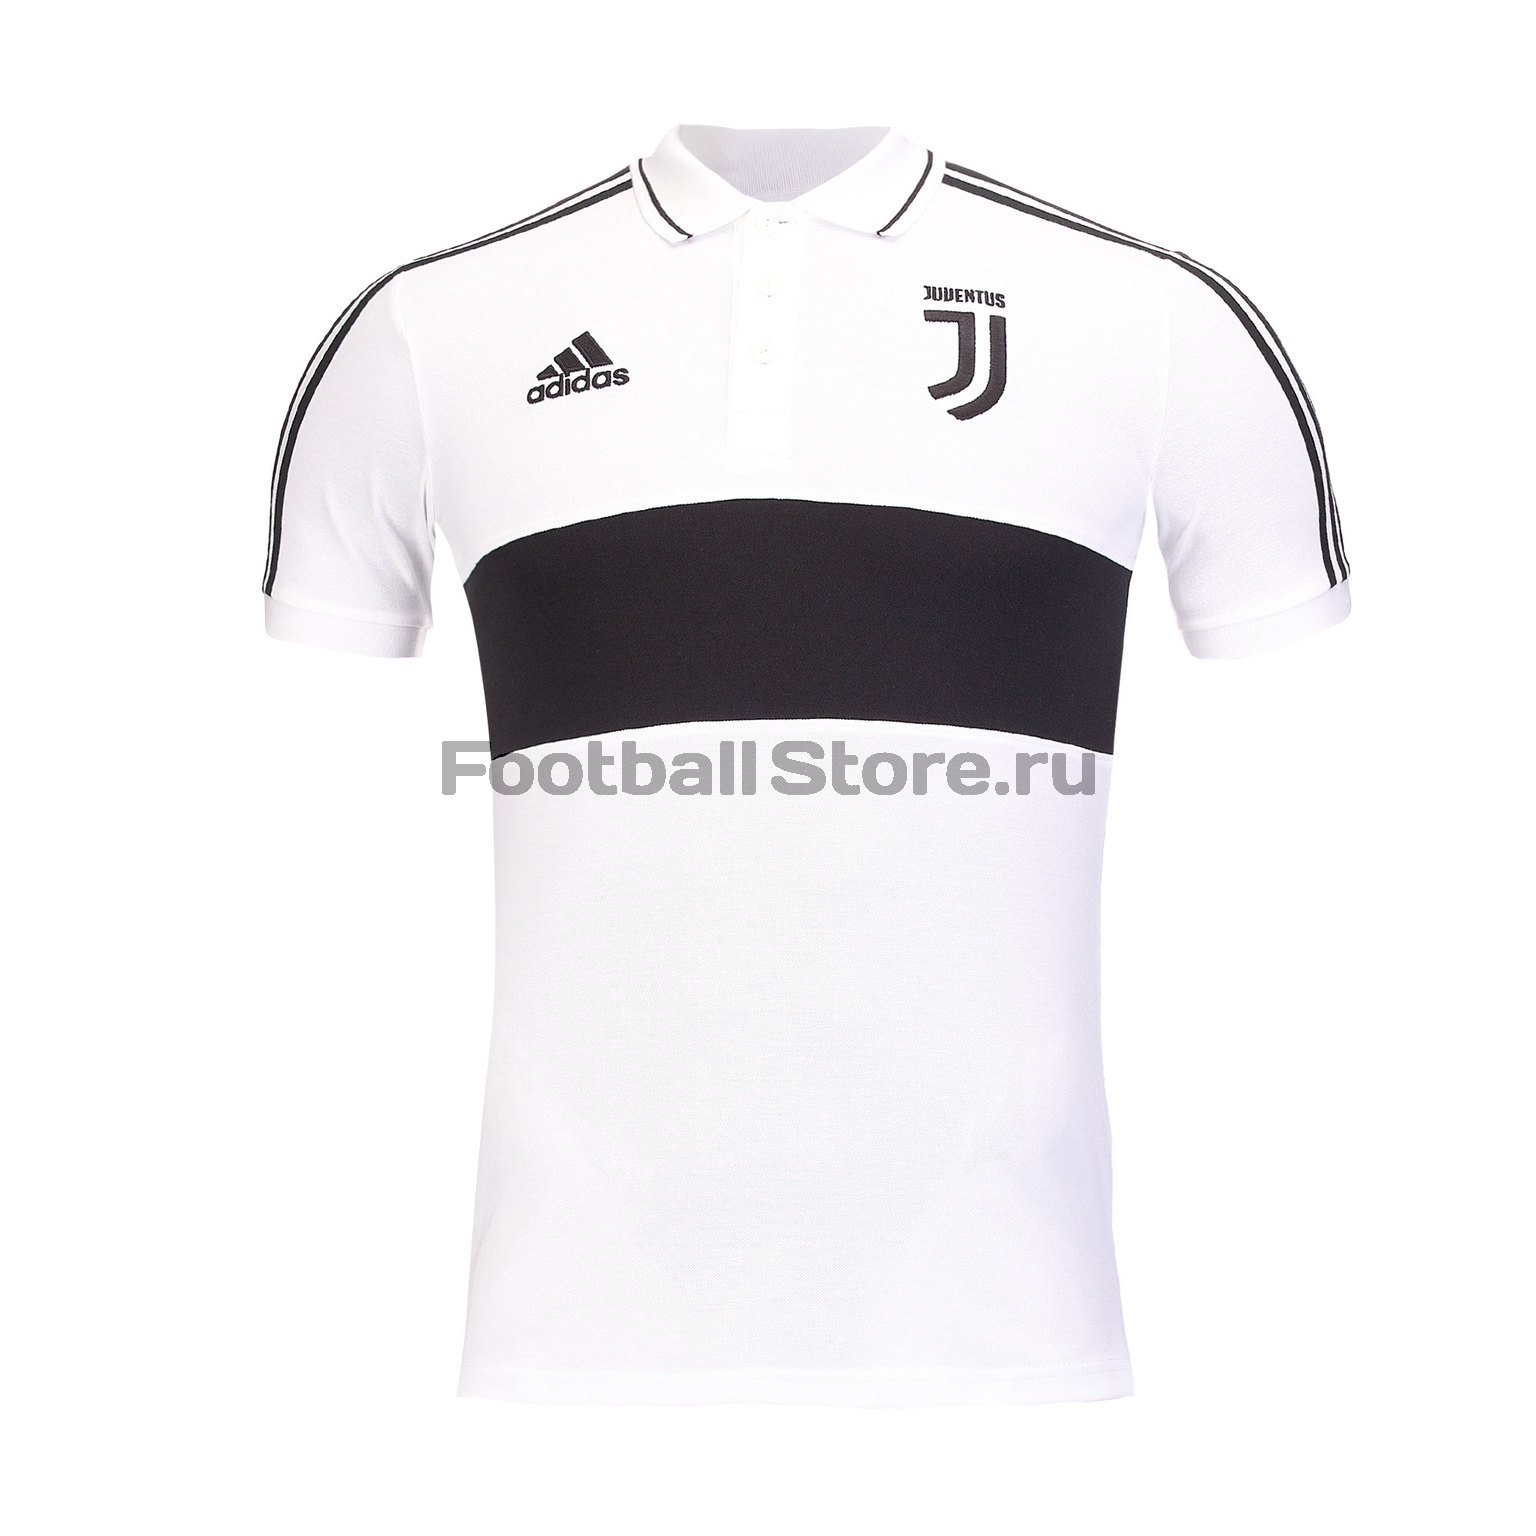 Поло Adidas Juventus 2019/20